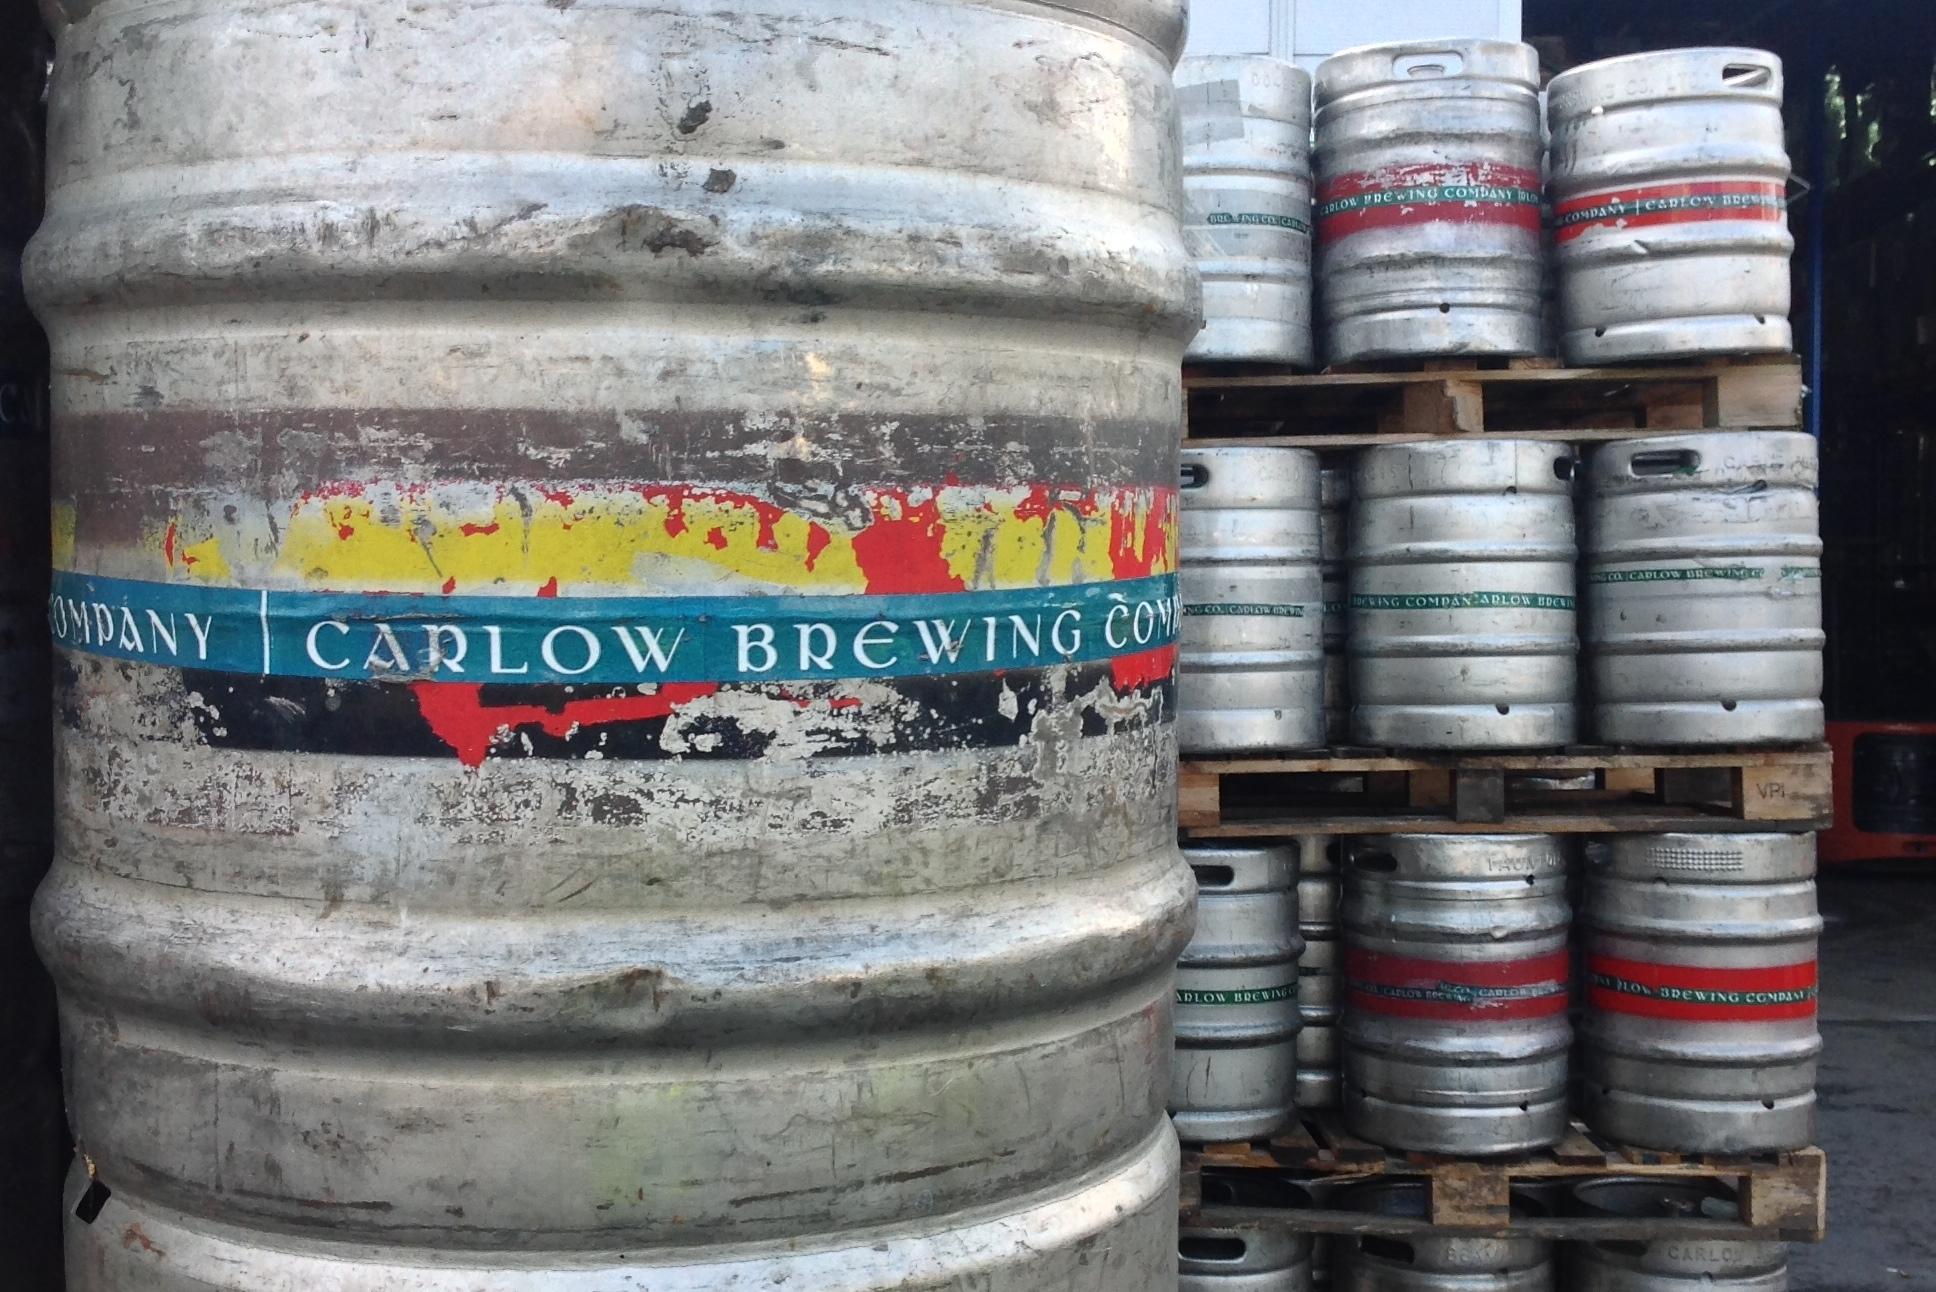 carlowbrewingcompany-keg